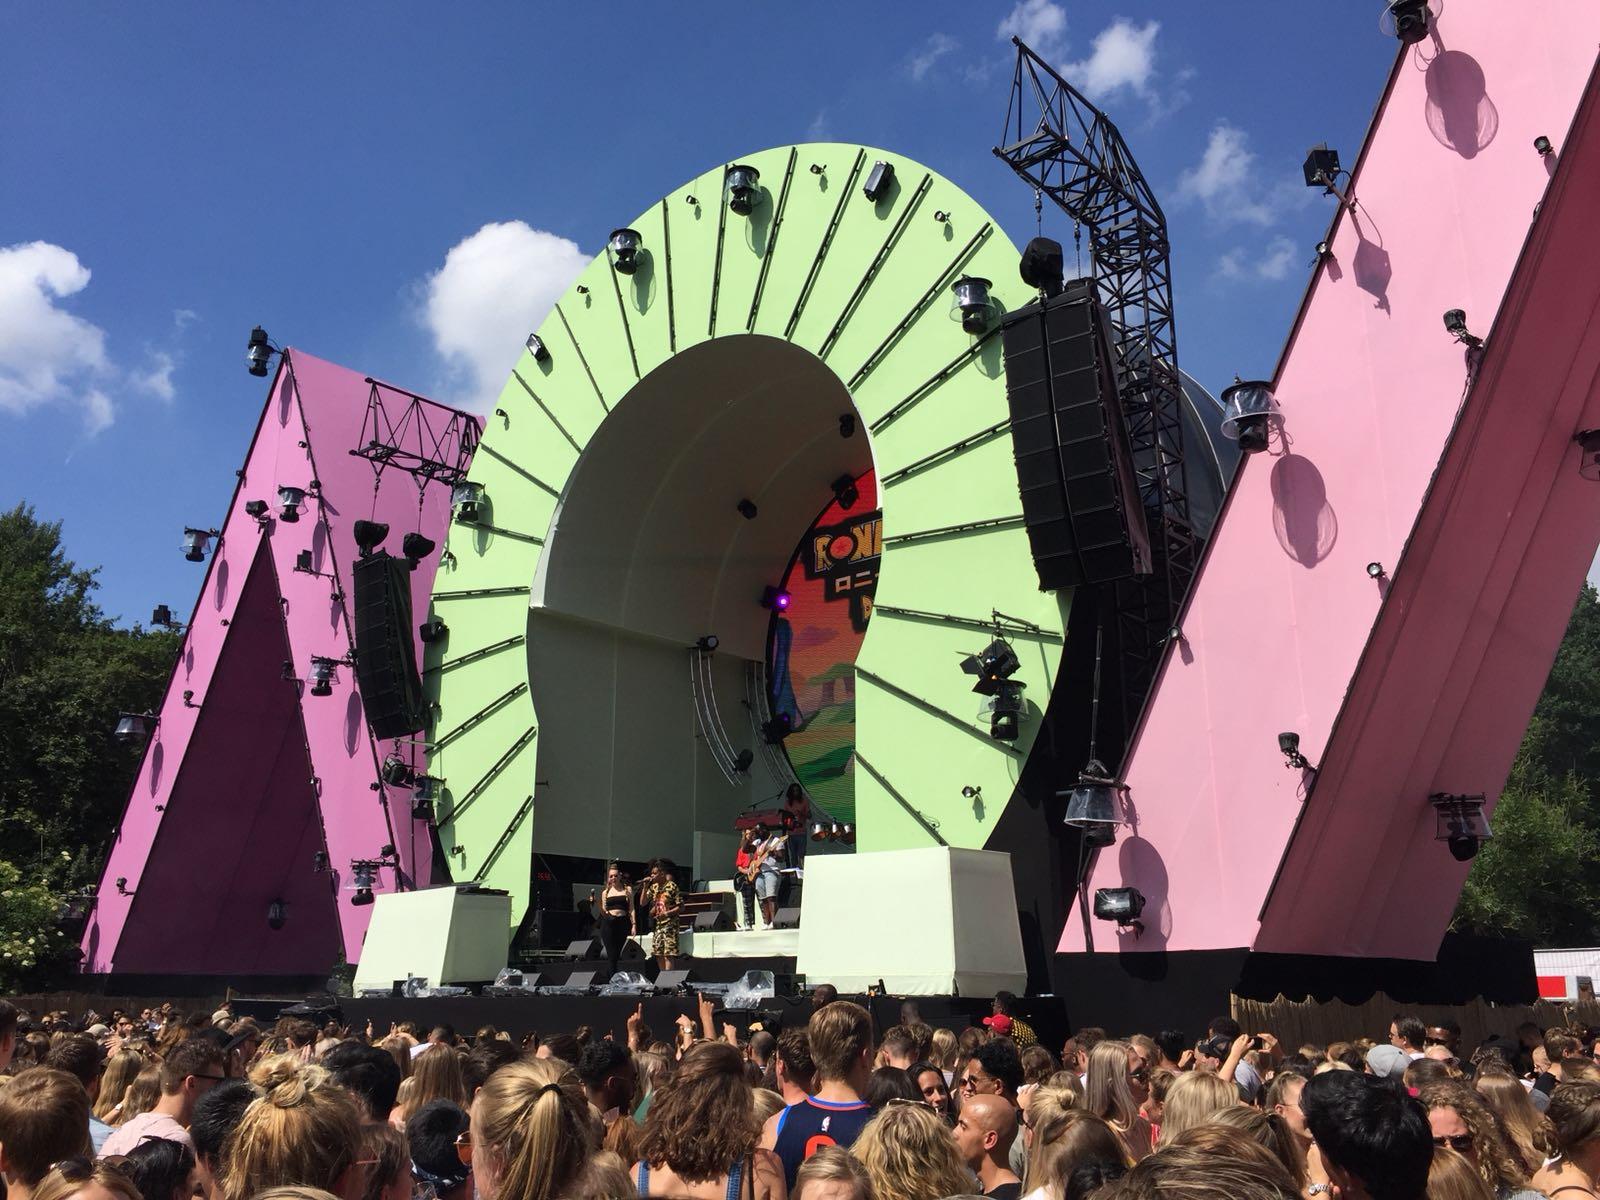 coreworks amsterdam open air